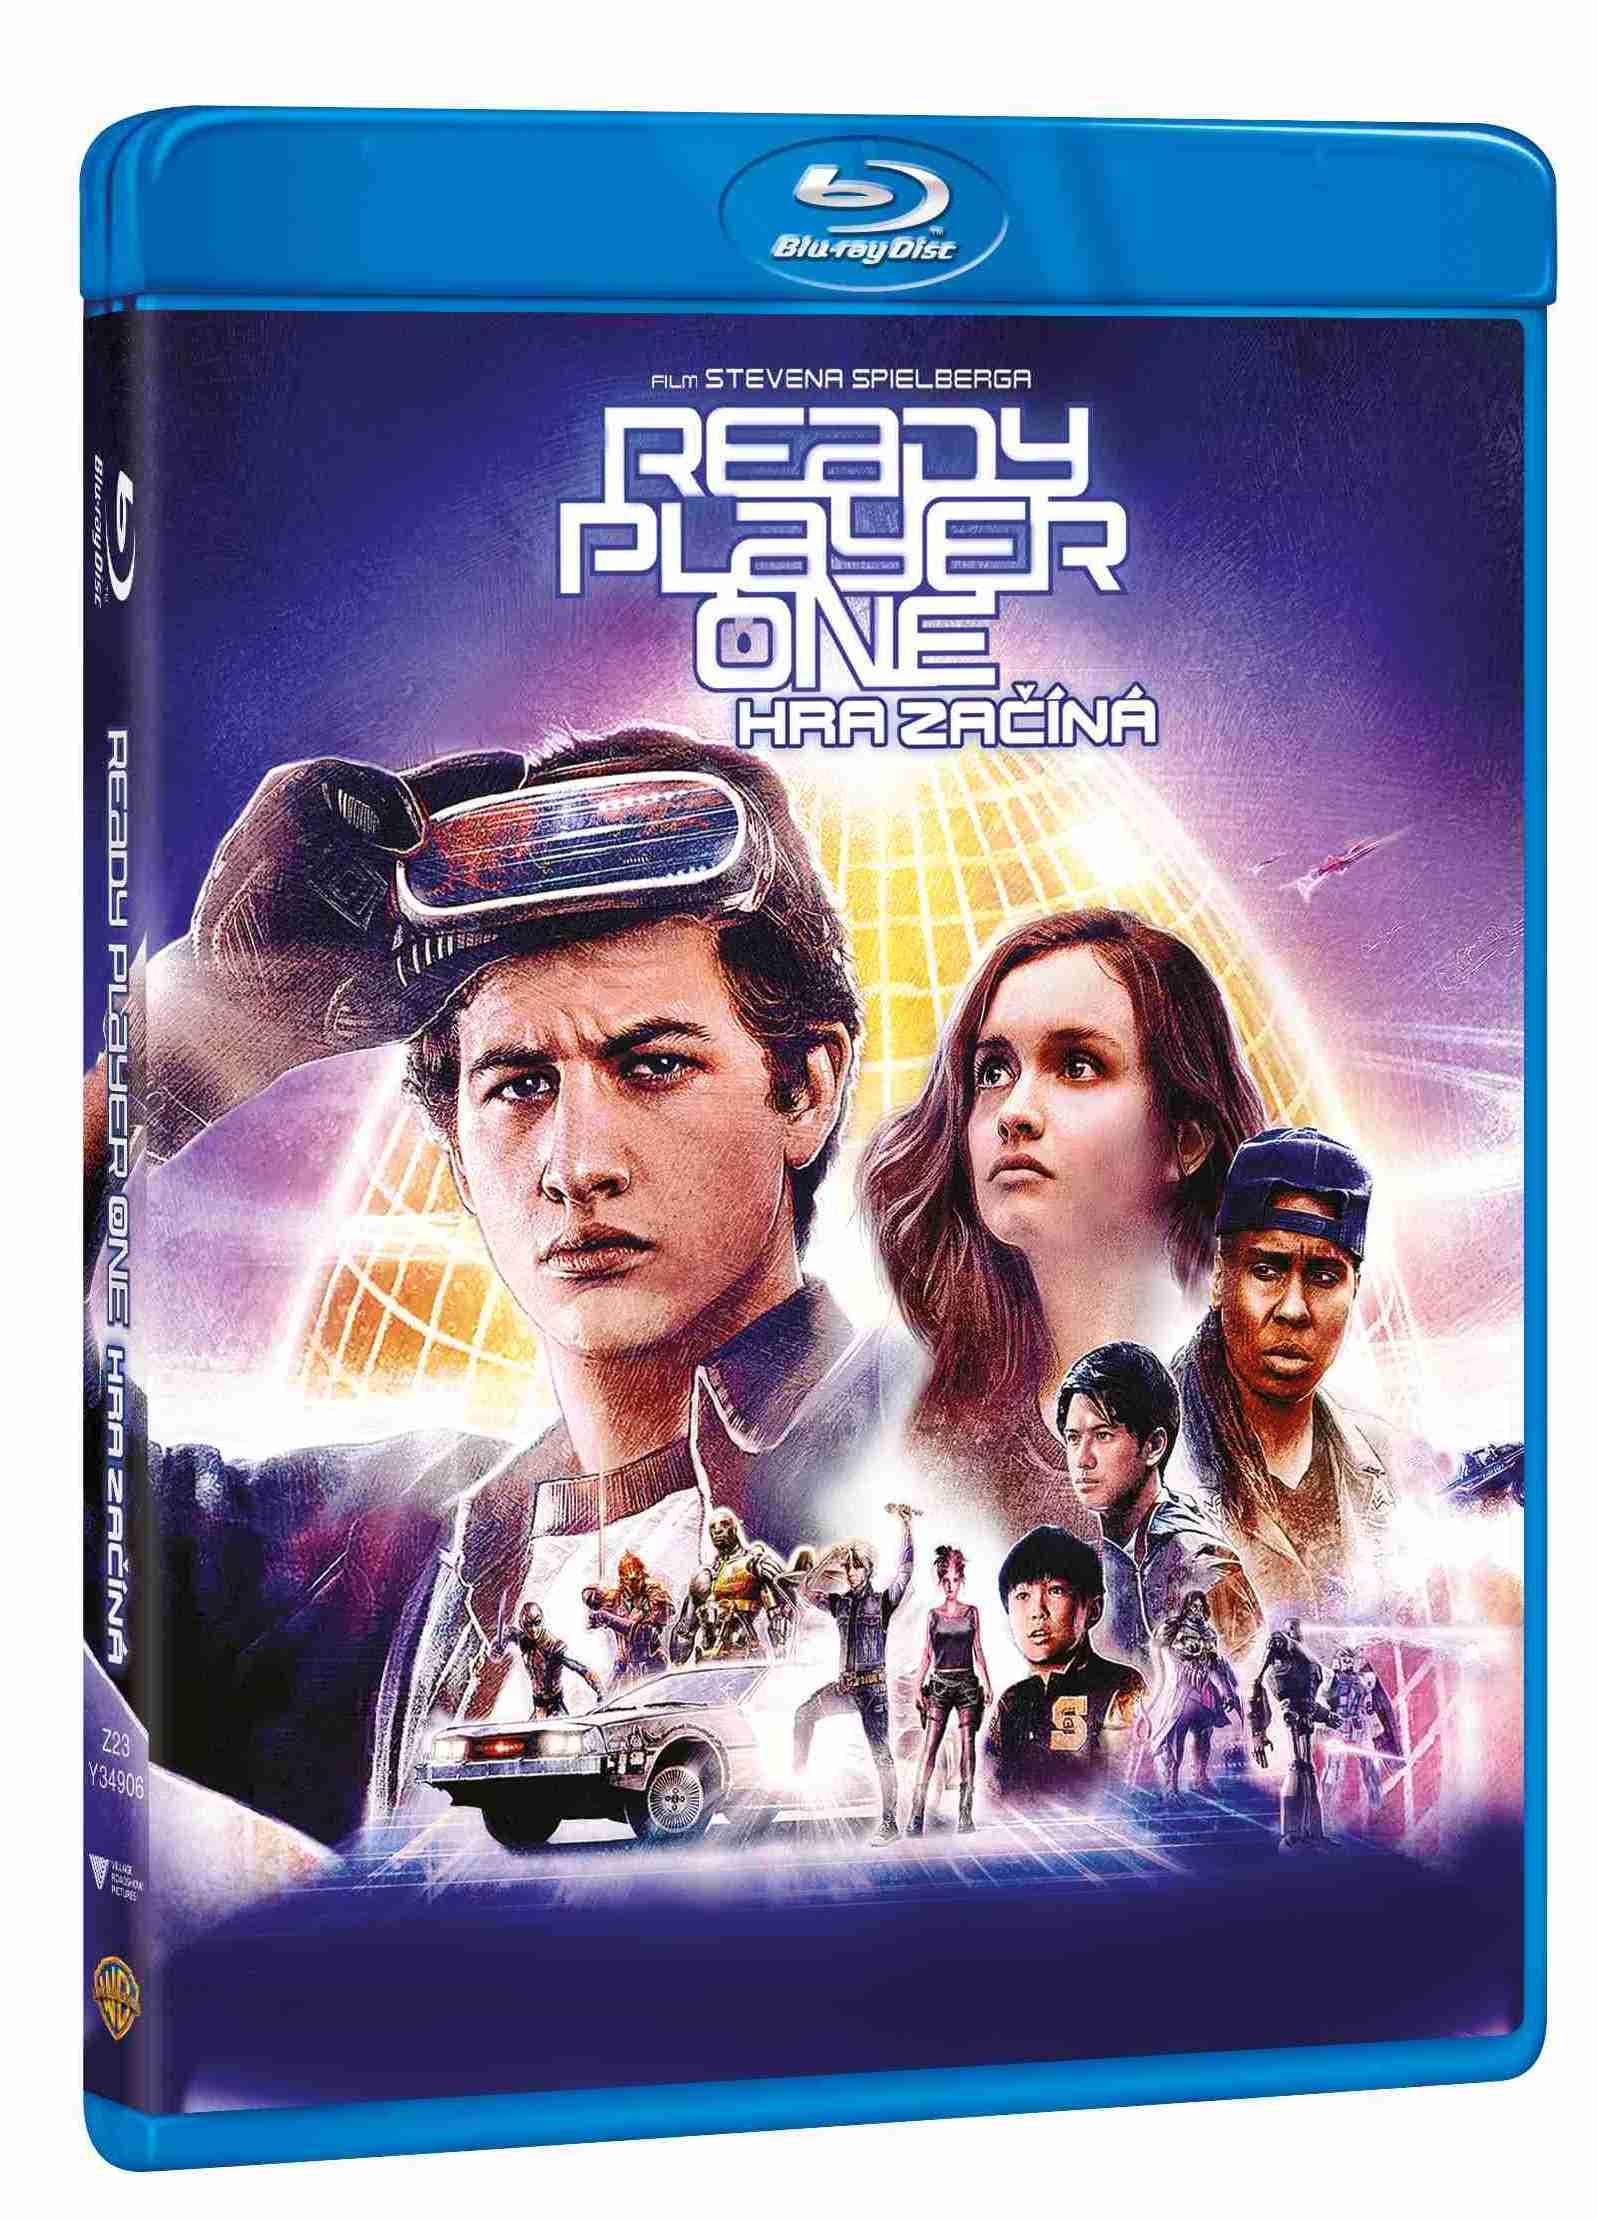 Ready Player One: Hra začíná - Blu-ray